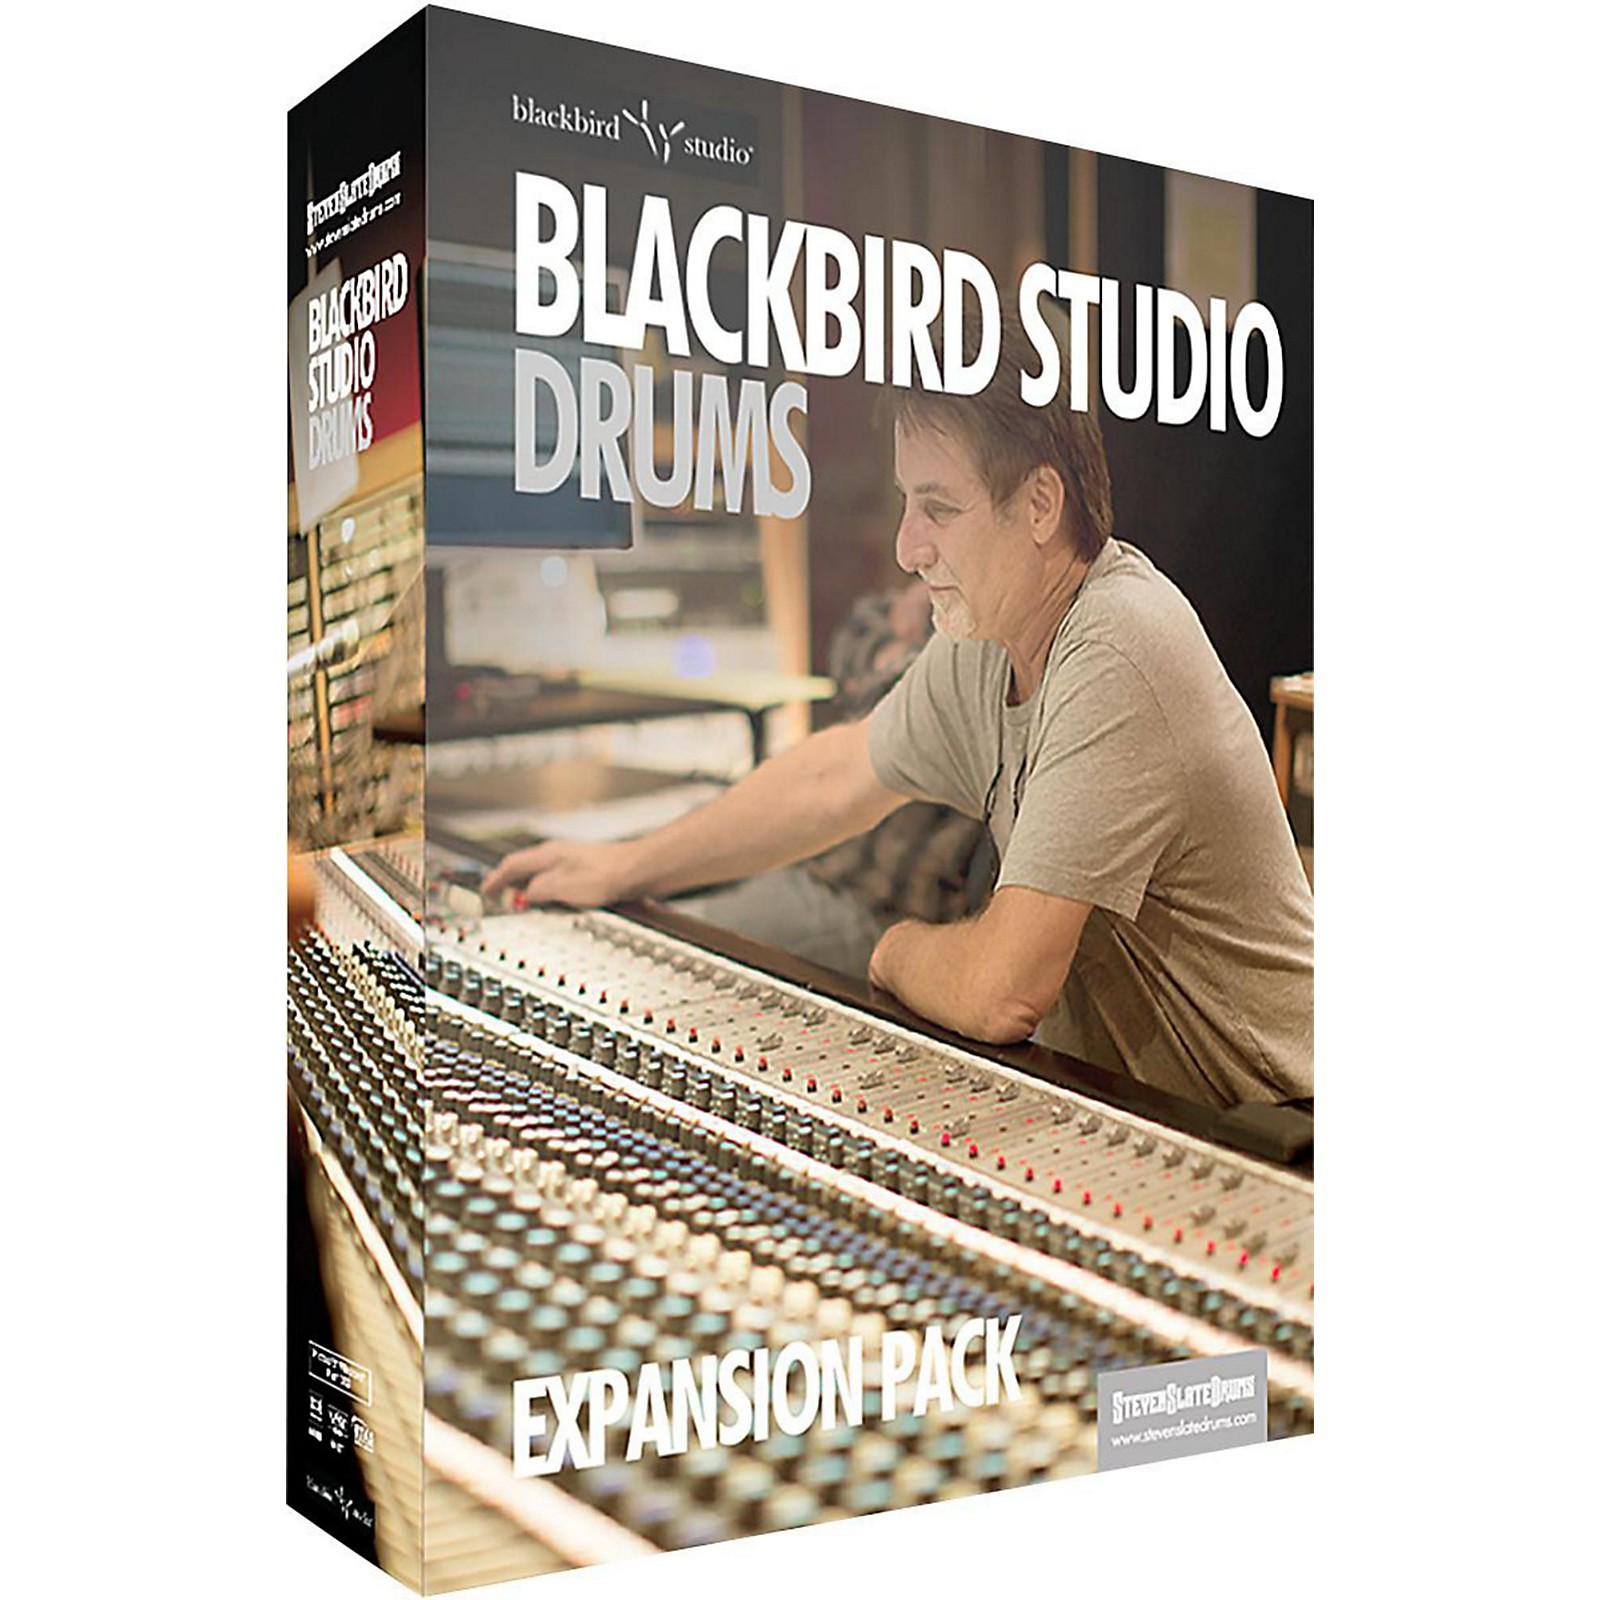 Steven Slate Drums Blackbird Studio SSD 4 Expansion